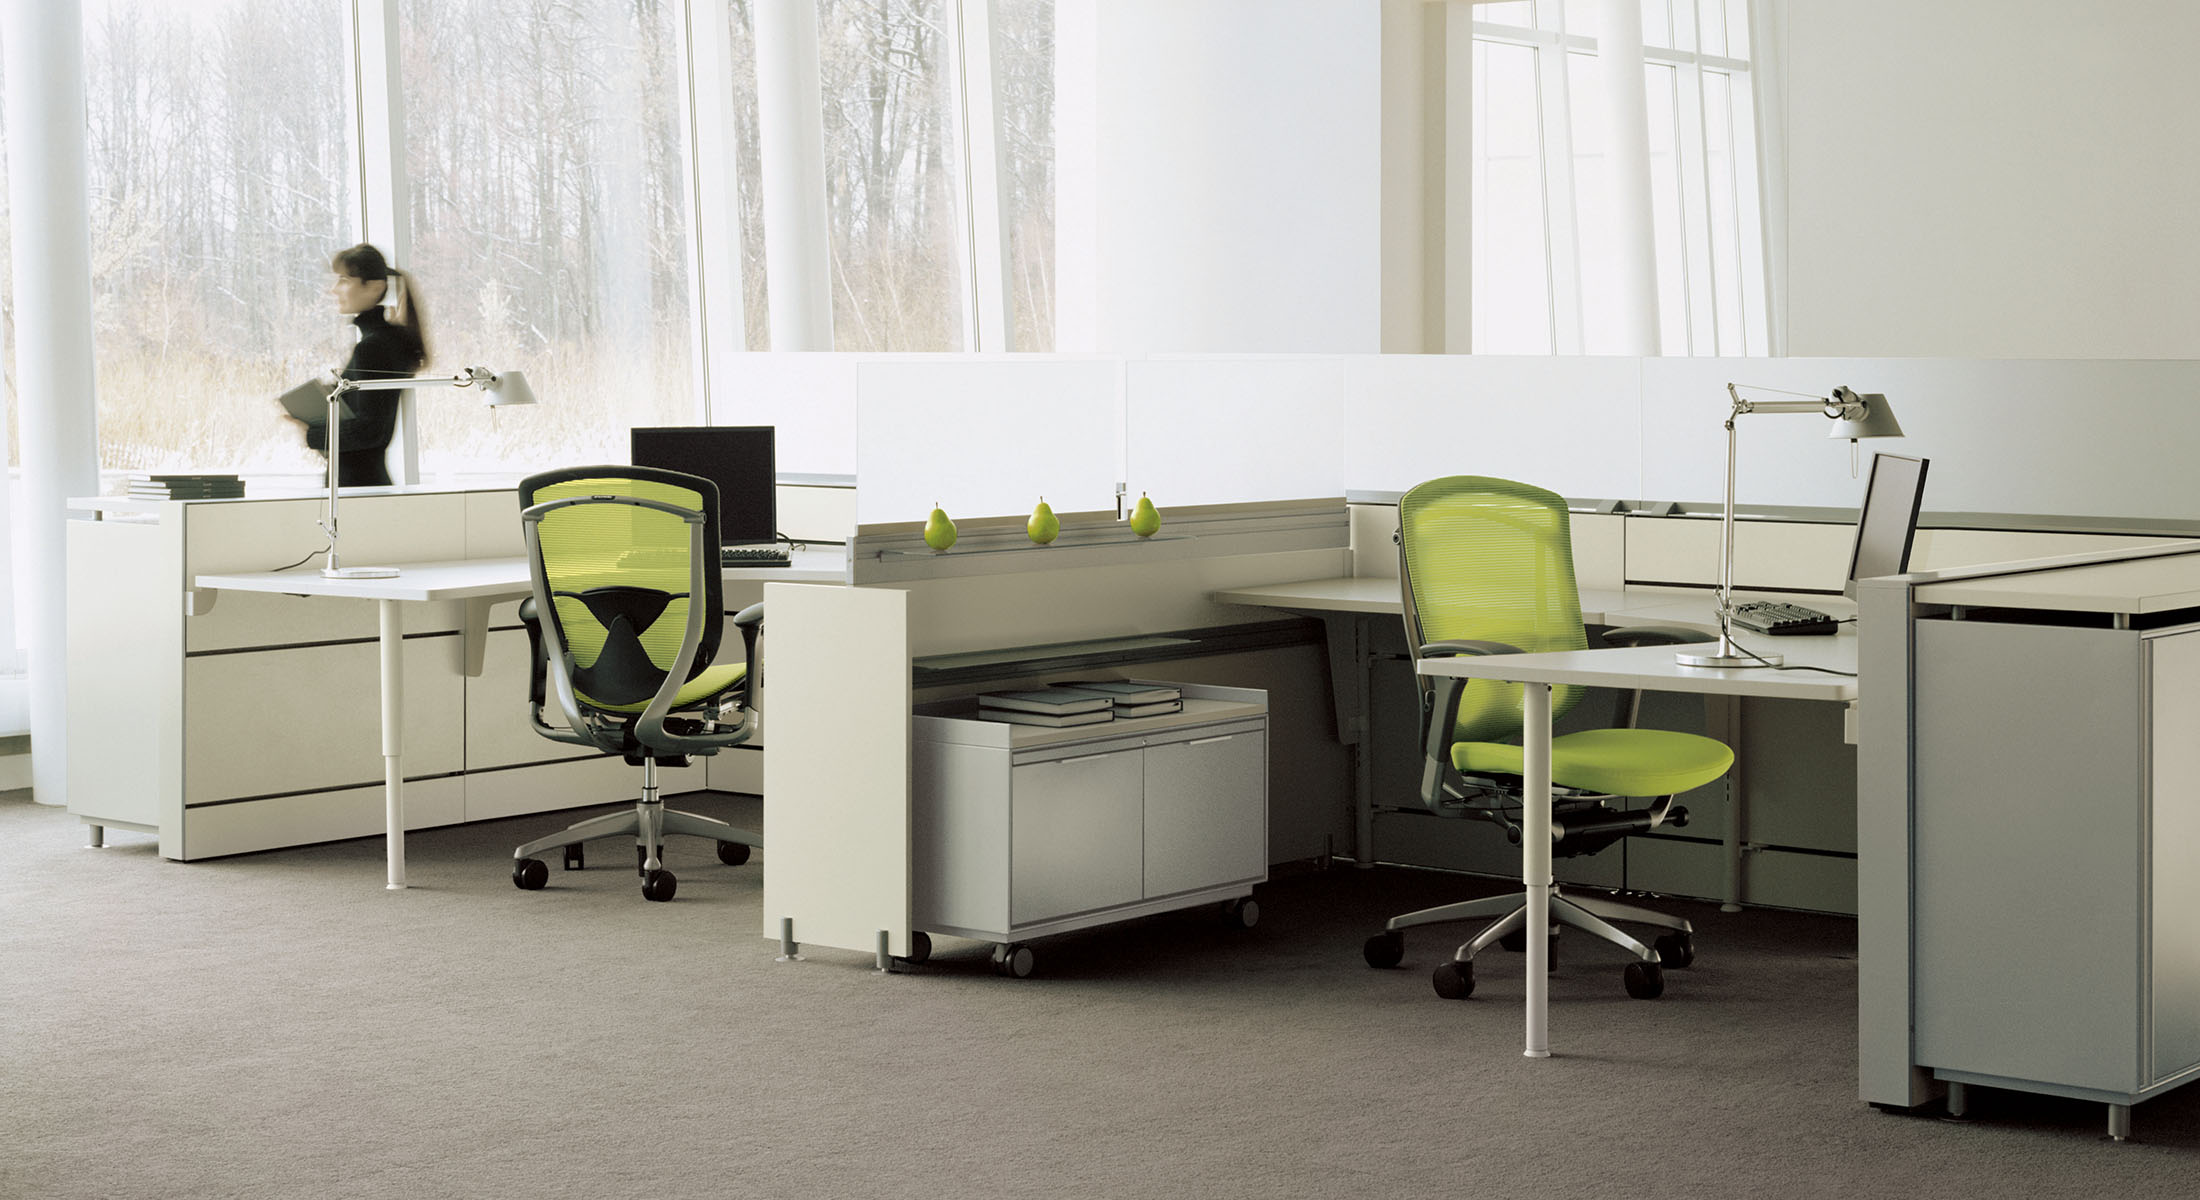 posh office furniture. Modular Office Furniture System 1. Transit 1 E Posh